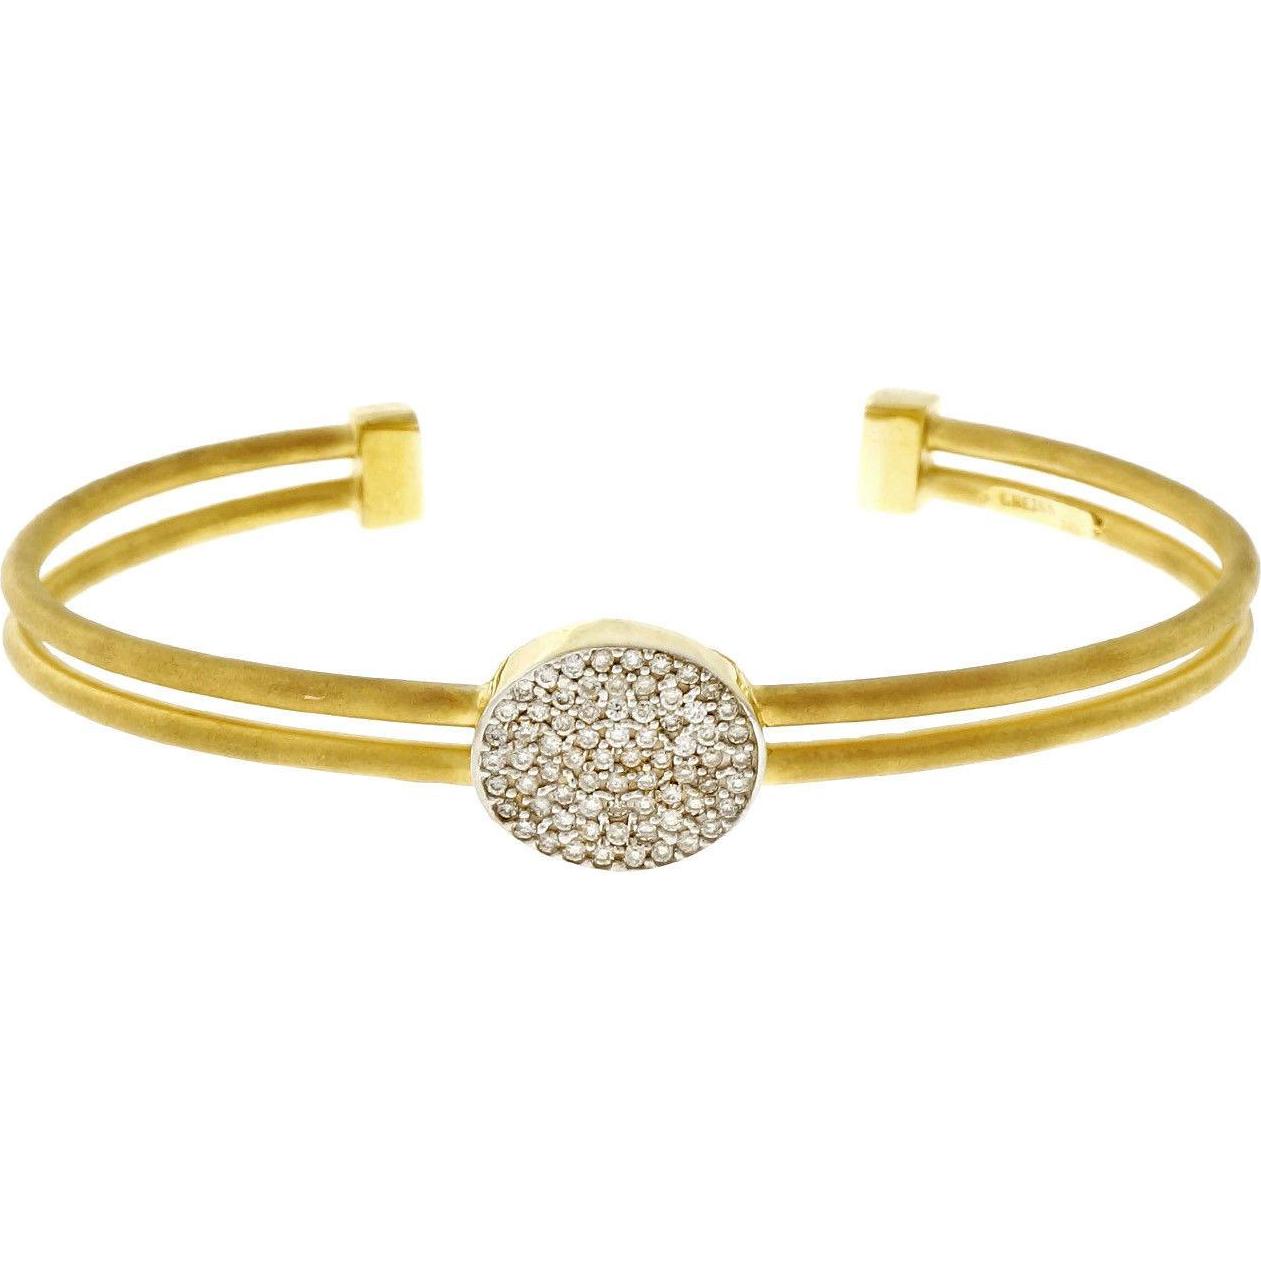 Isaac Reiss Diamond 14 Karat Yellow Gold Slip On Bangle Bracelet